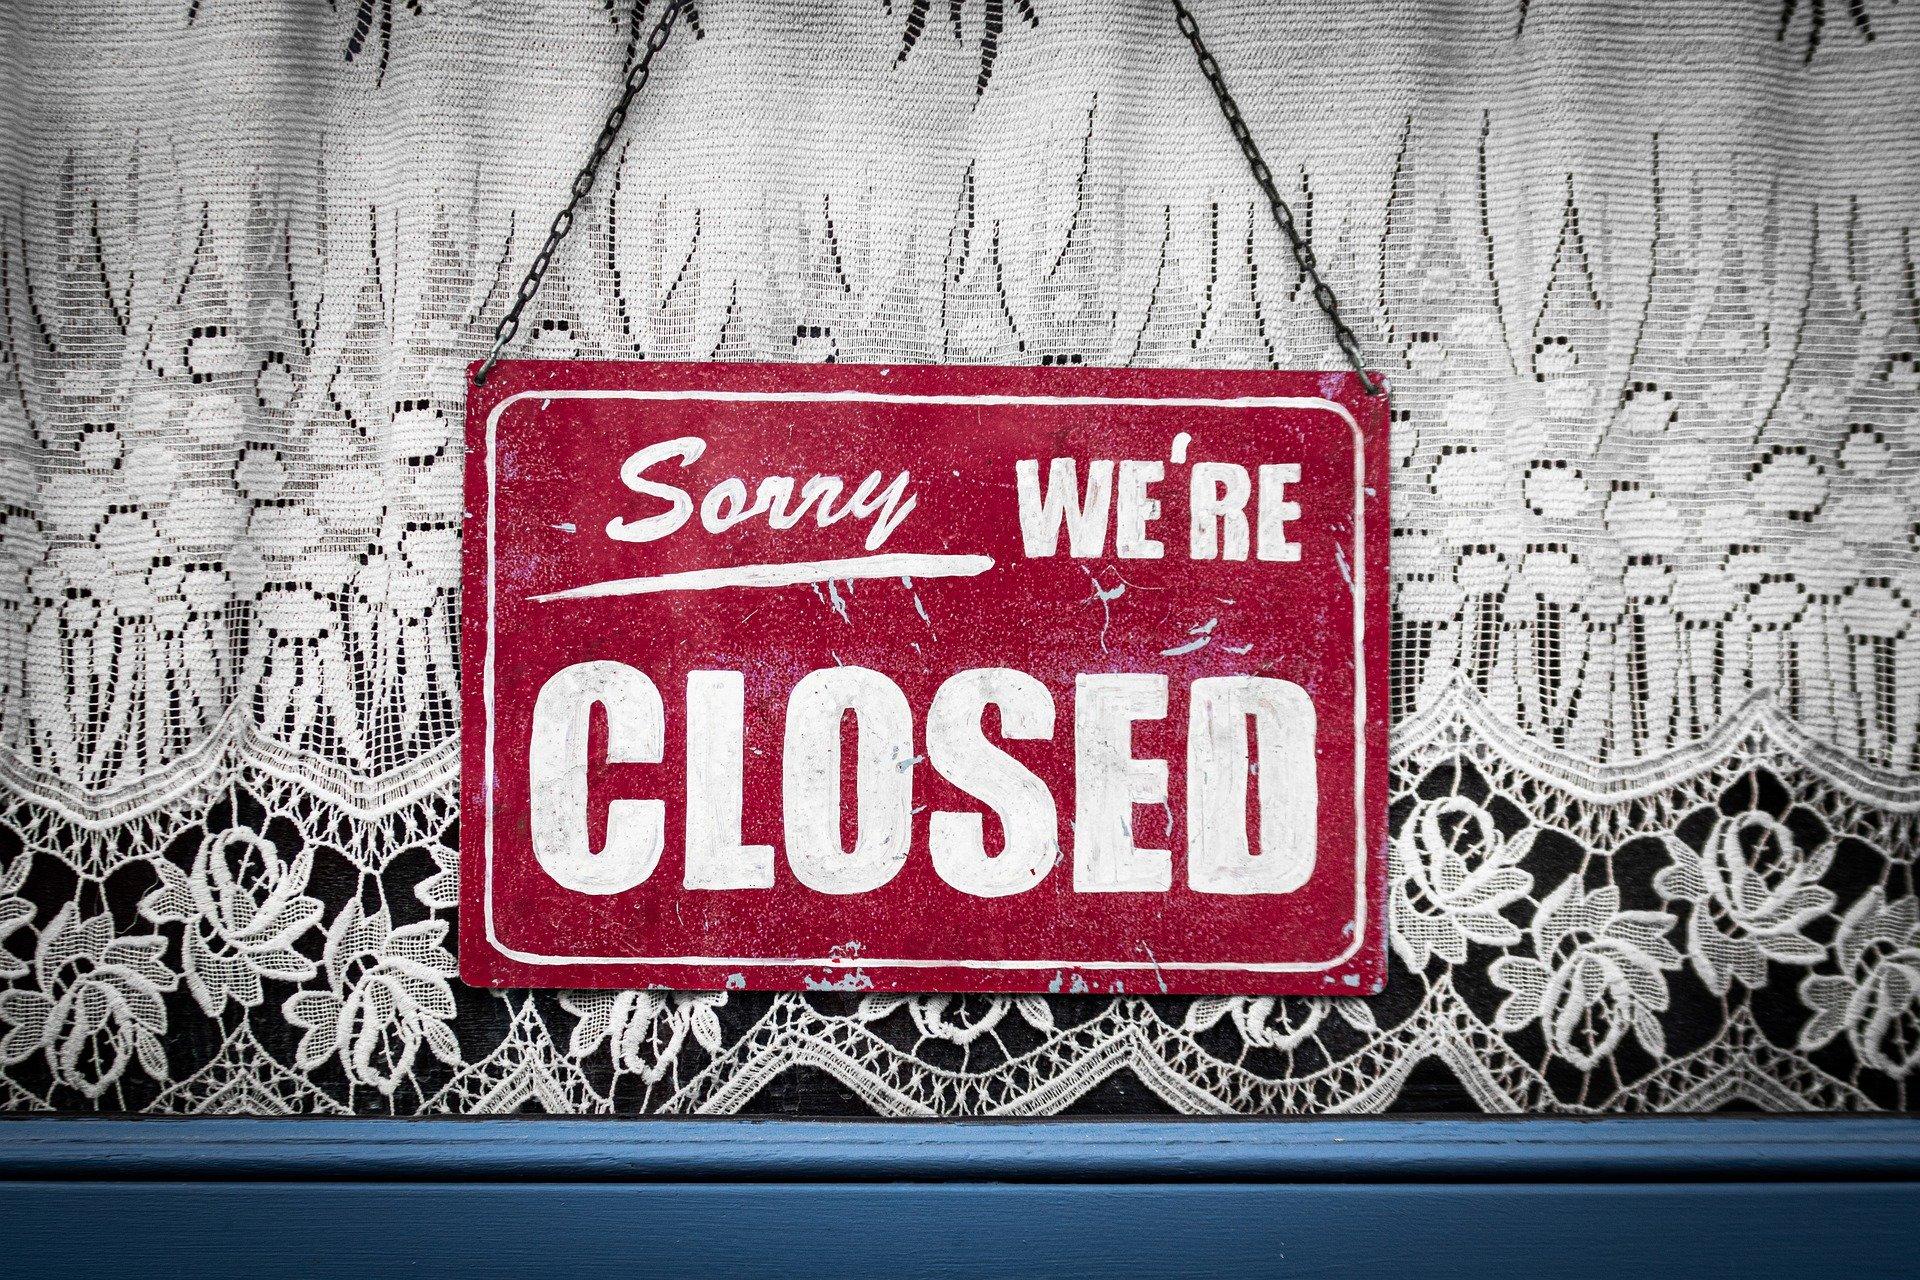 Closed sign. Photo by Tobias Heine on Pixabay